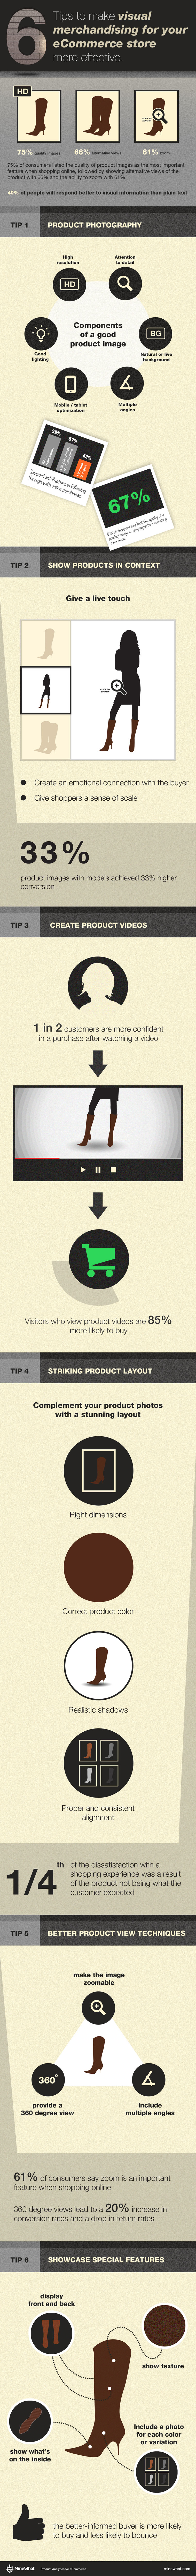 eCommerce: Visual Merchandising Tips